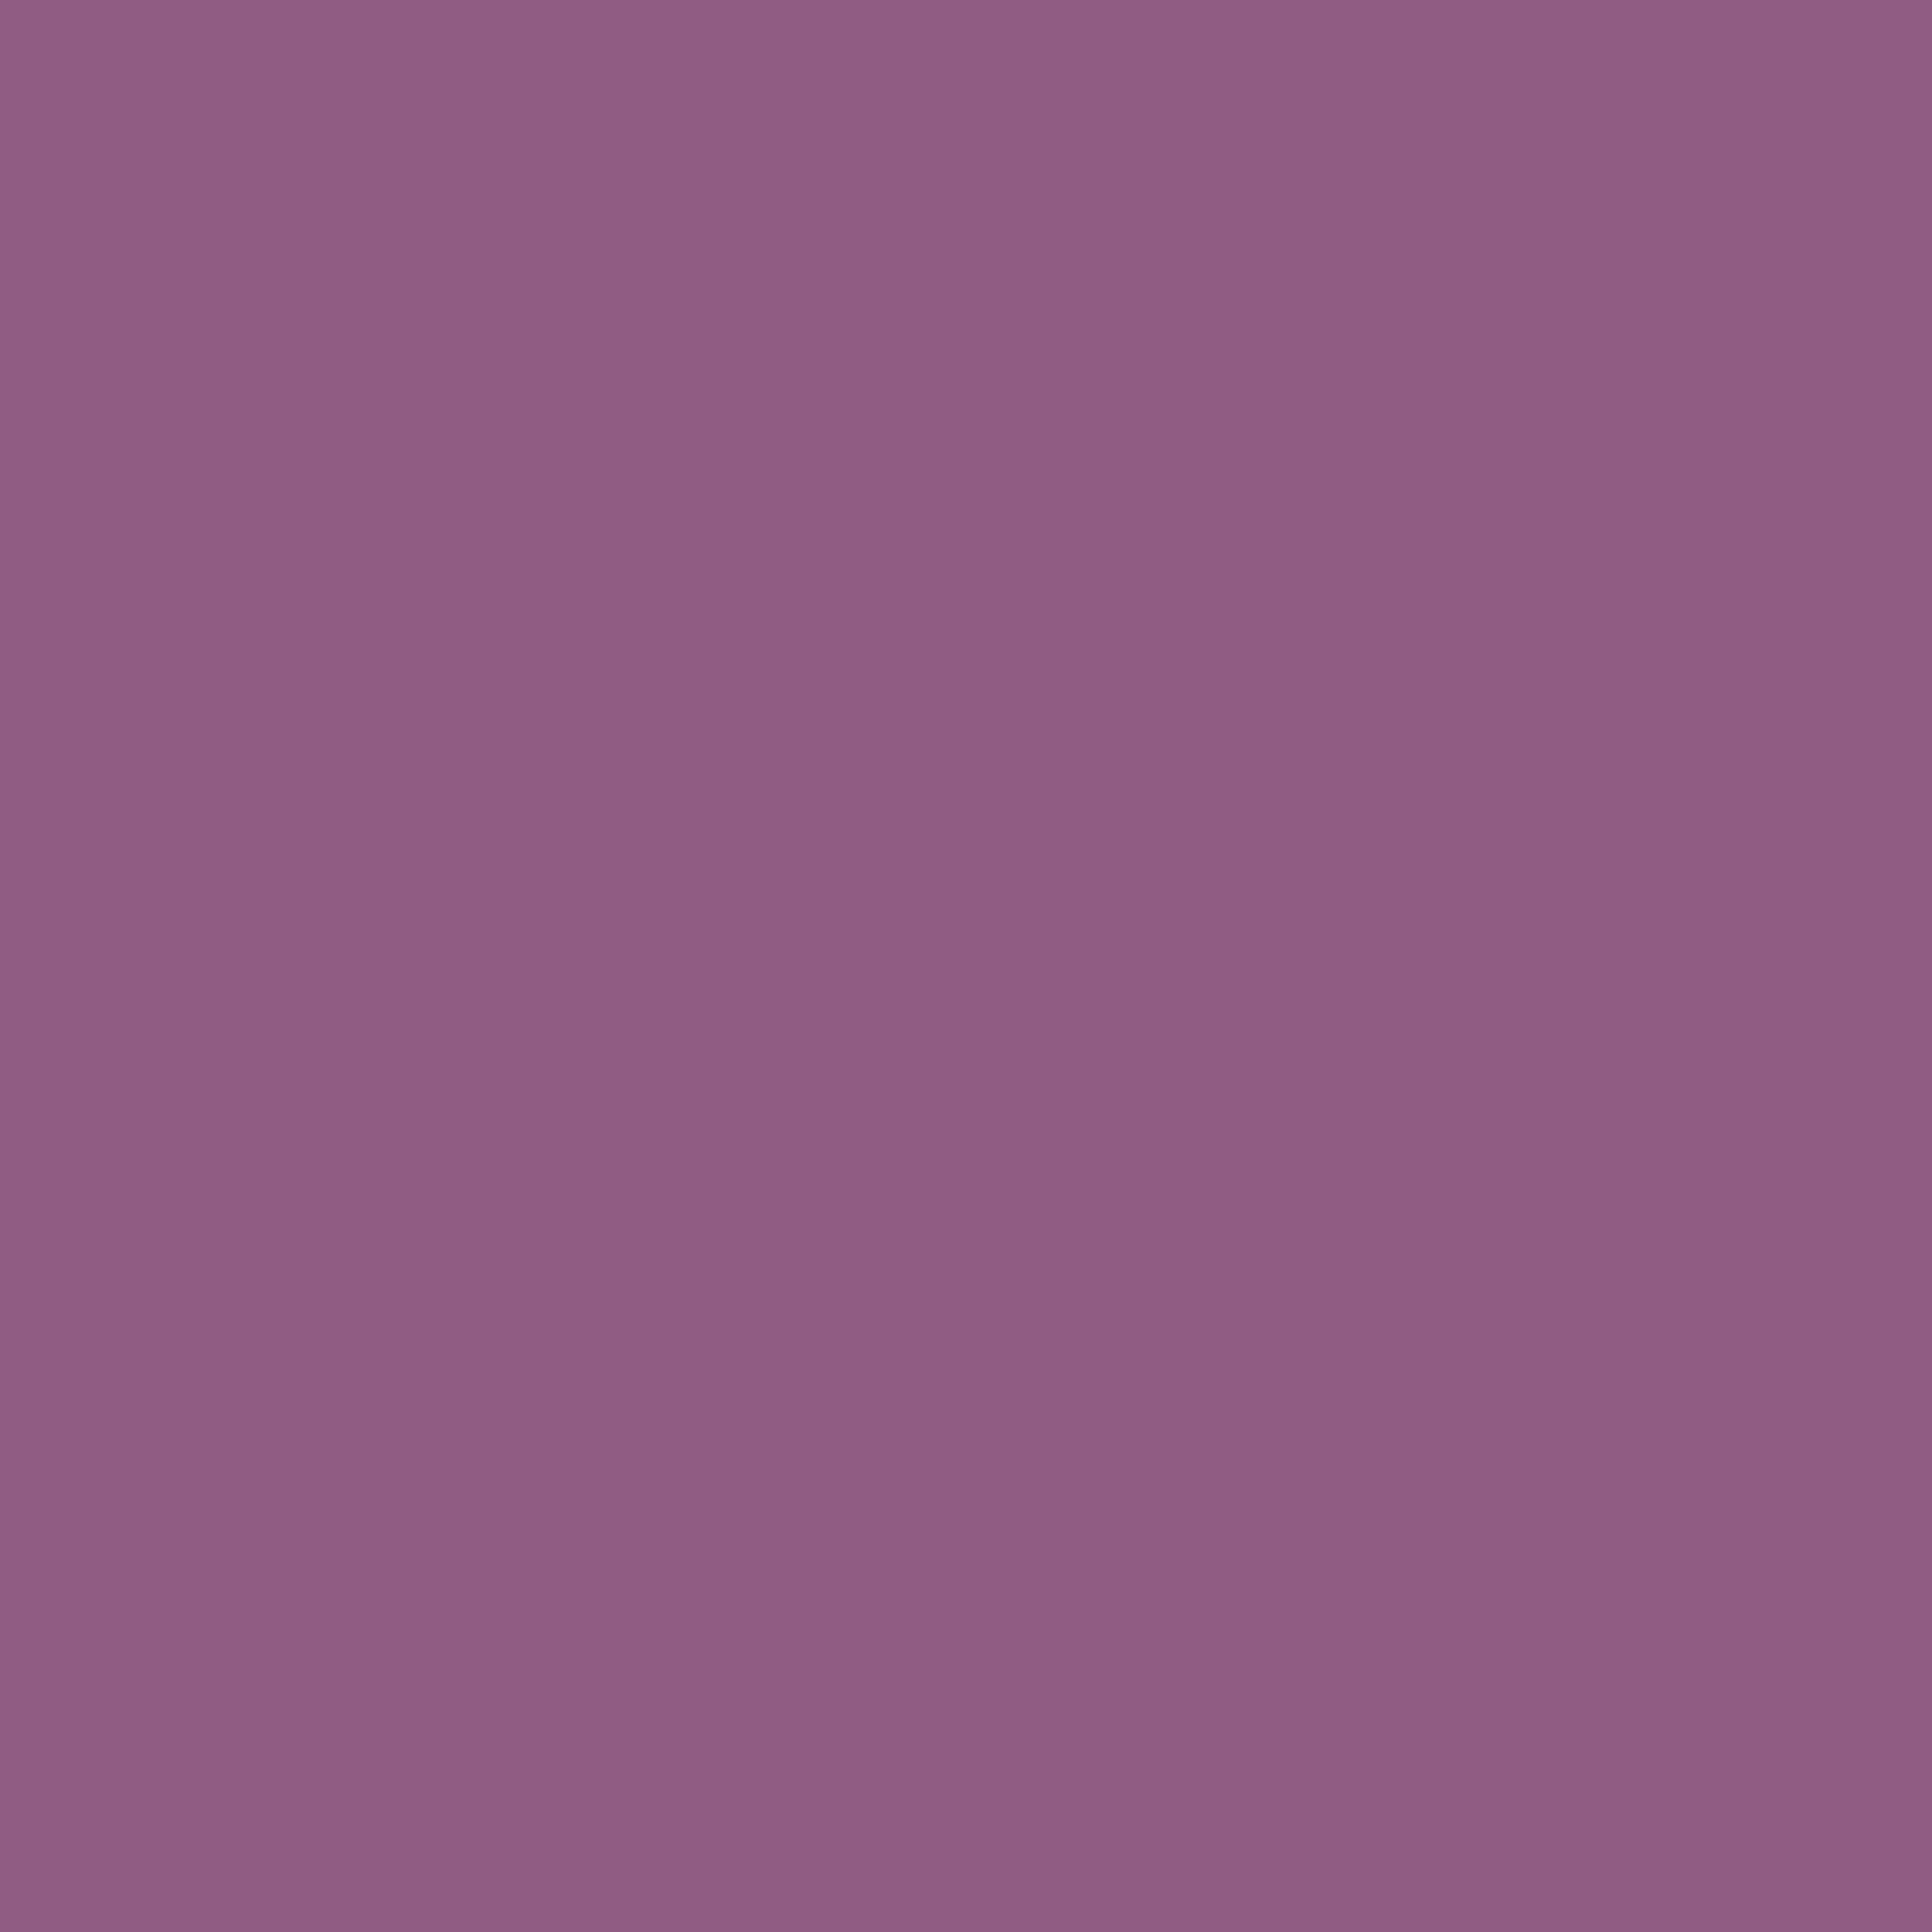 2732x2732 Antique Fuchsia Solid Color Background